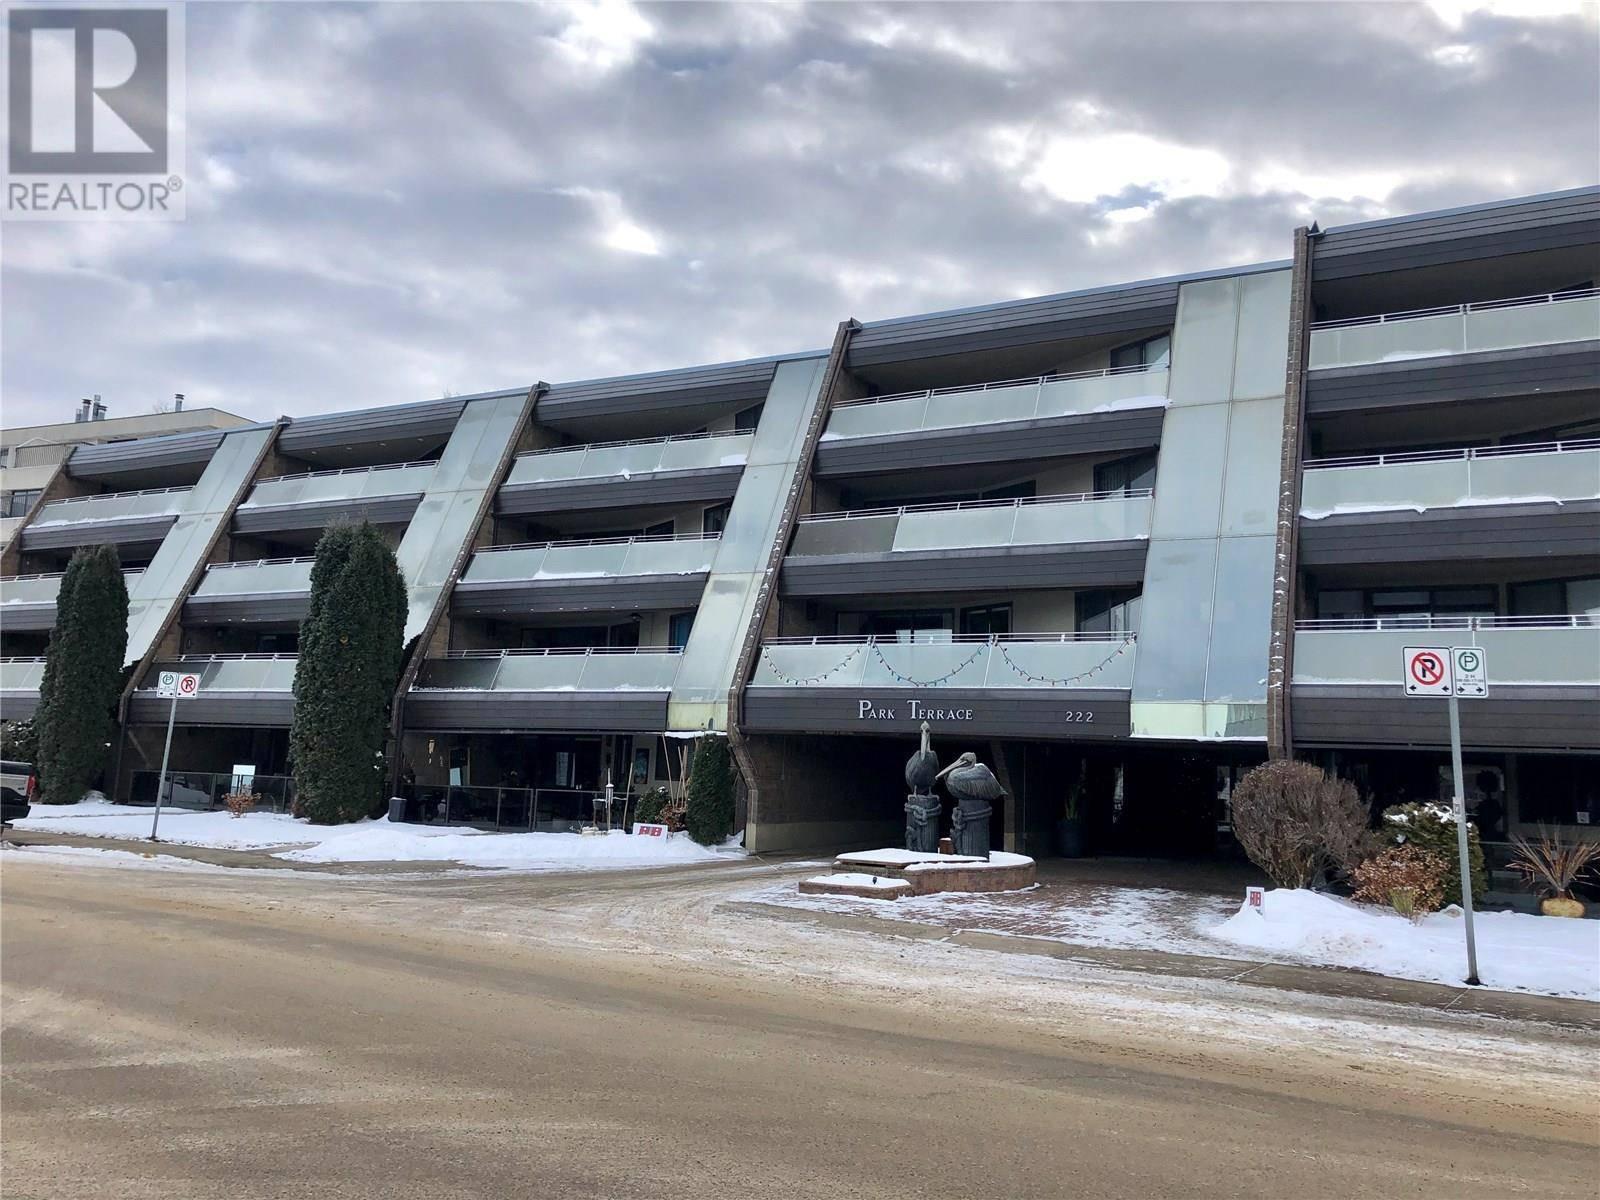 Condo for sale at 222 Saskatchewan Cres E Unit 305 Saskatoon Saskatchewan - MLS: SK793867